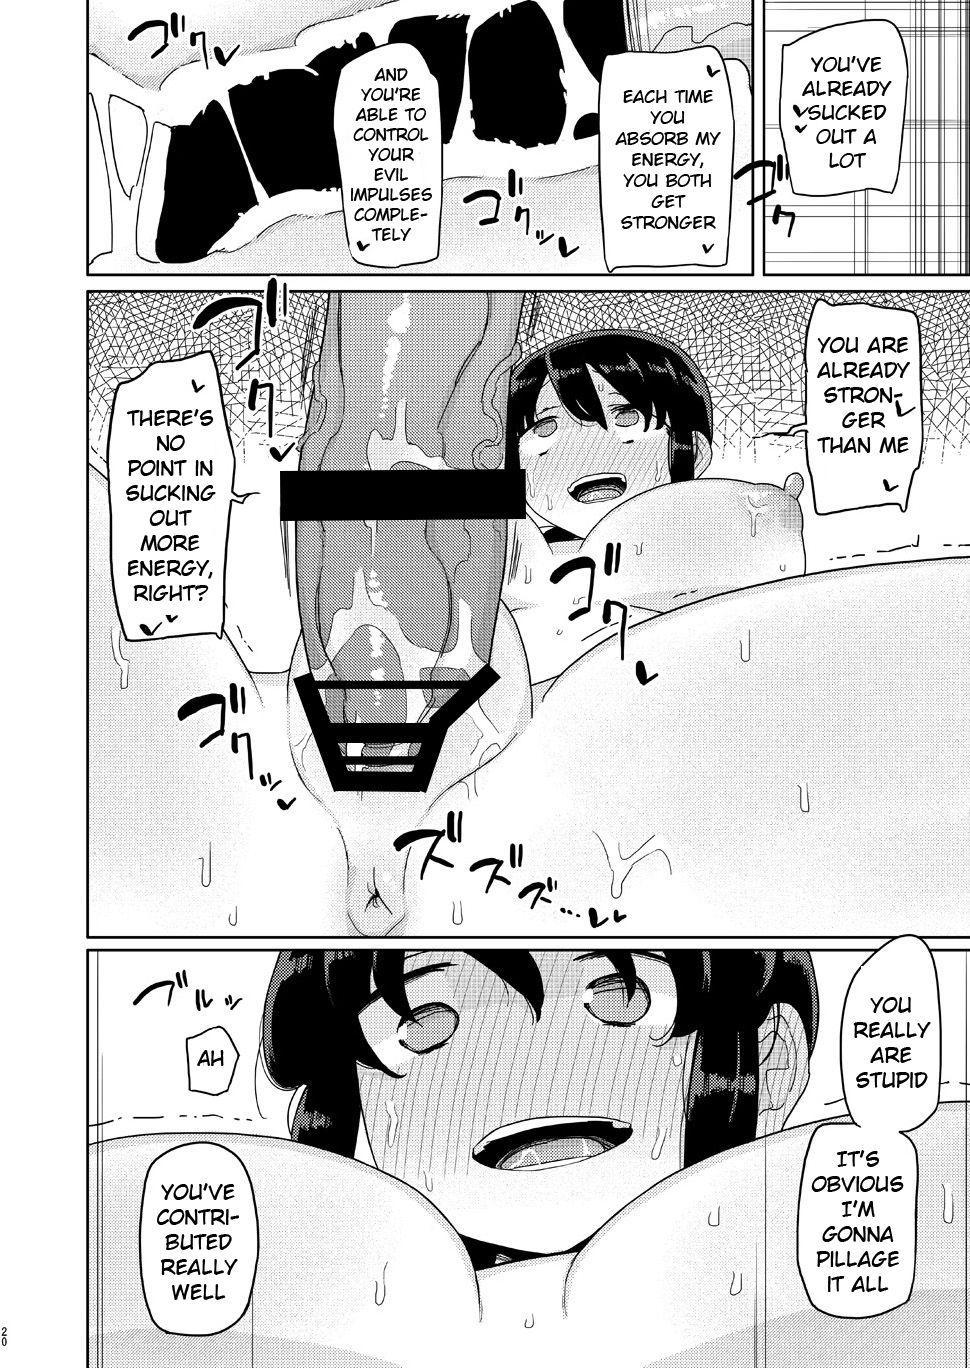 Ore ga Ijimeteta Onna ga Henshin Heroine ni Natta node   The Girl i used to Bully became a Super Heroine 18